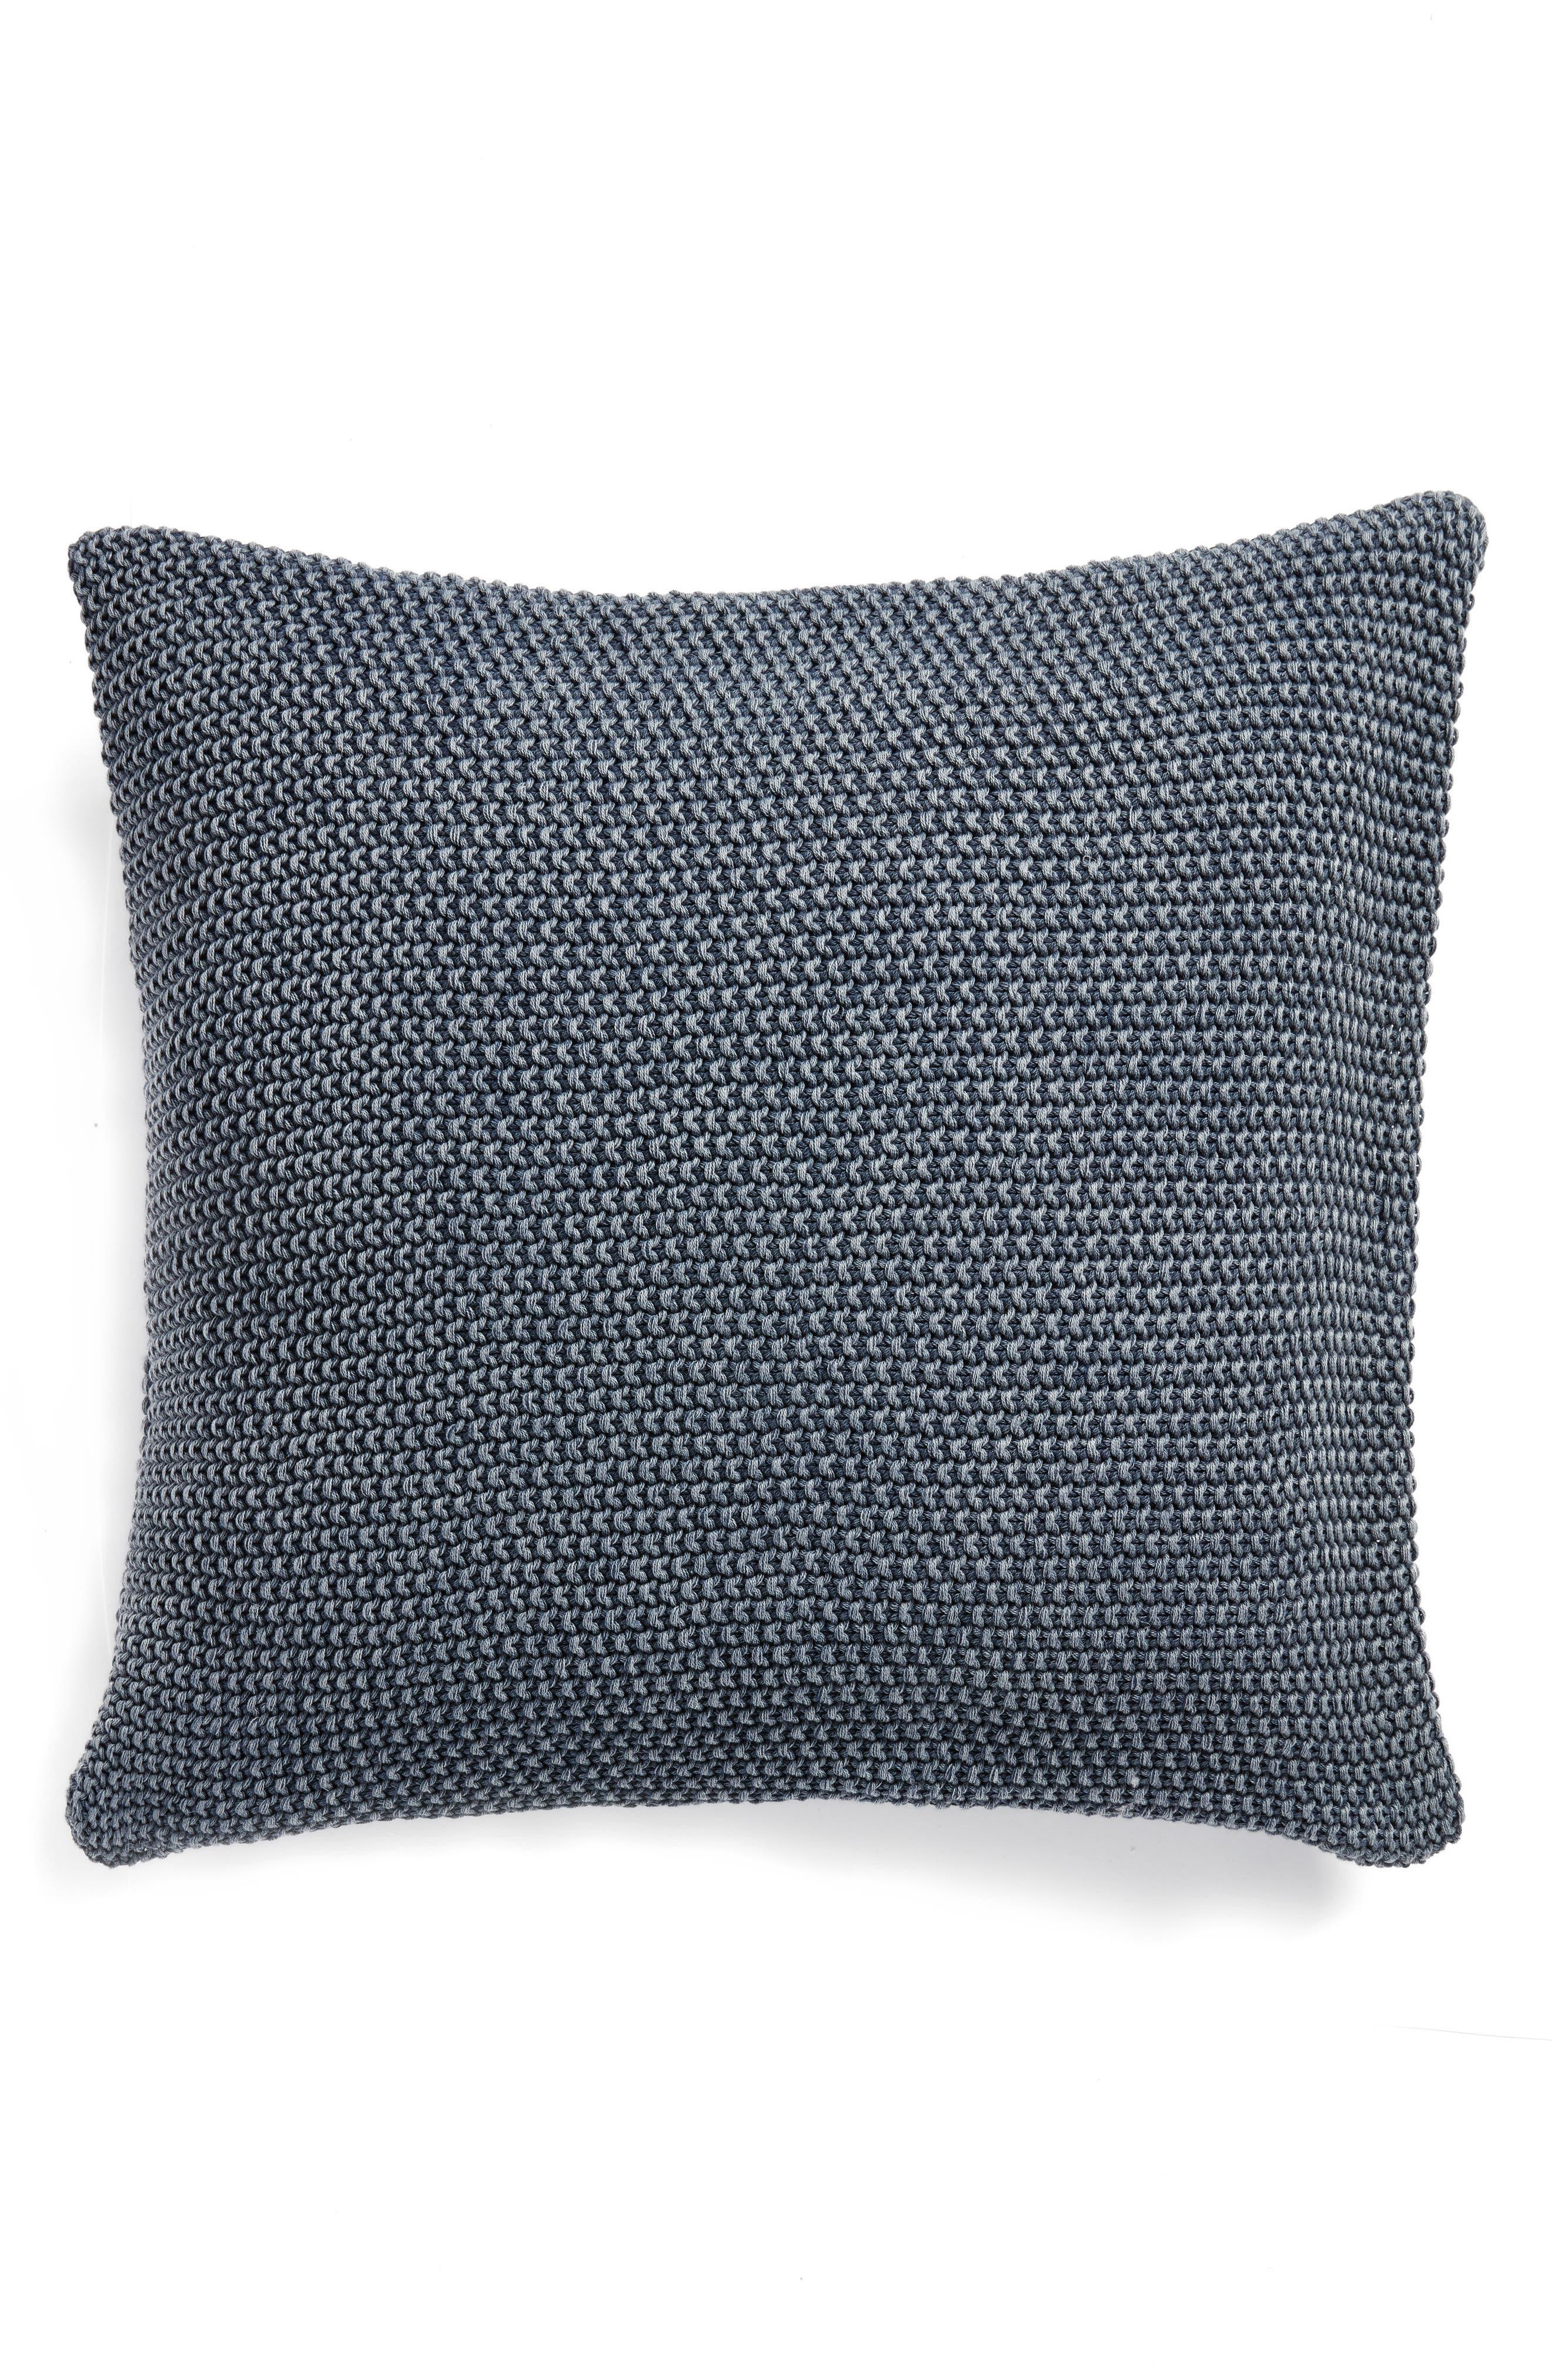 Treasure & Bond Seed Stitch Accent Pillow